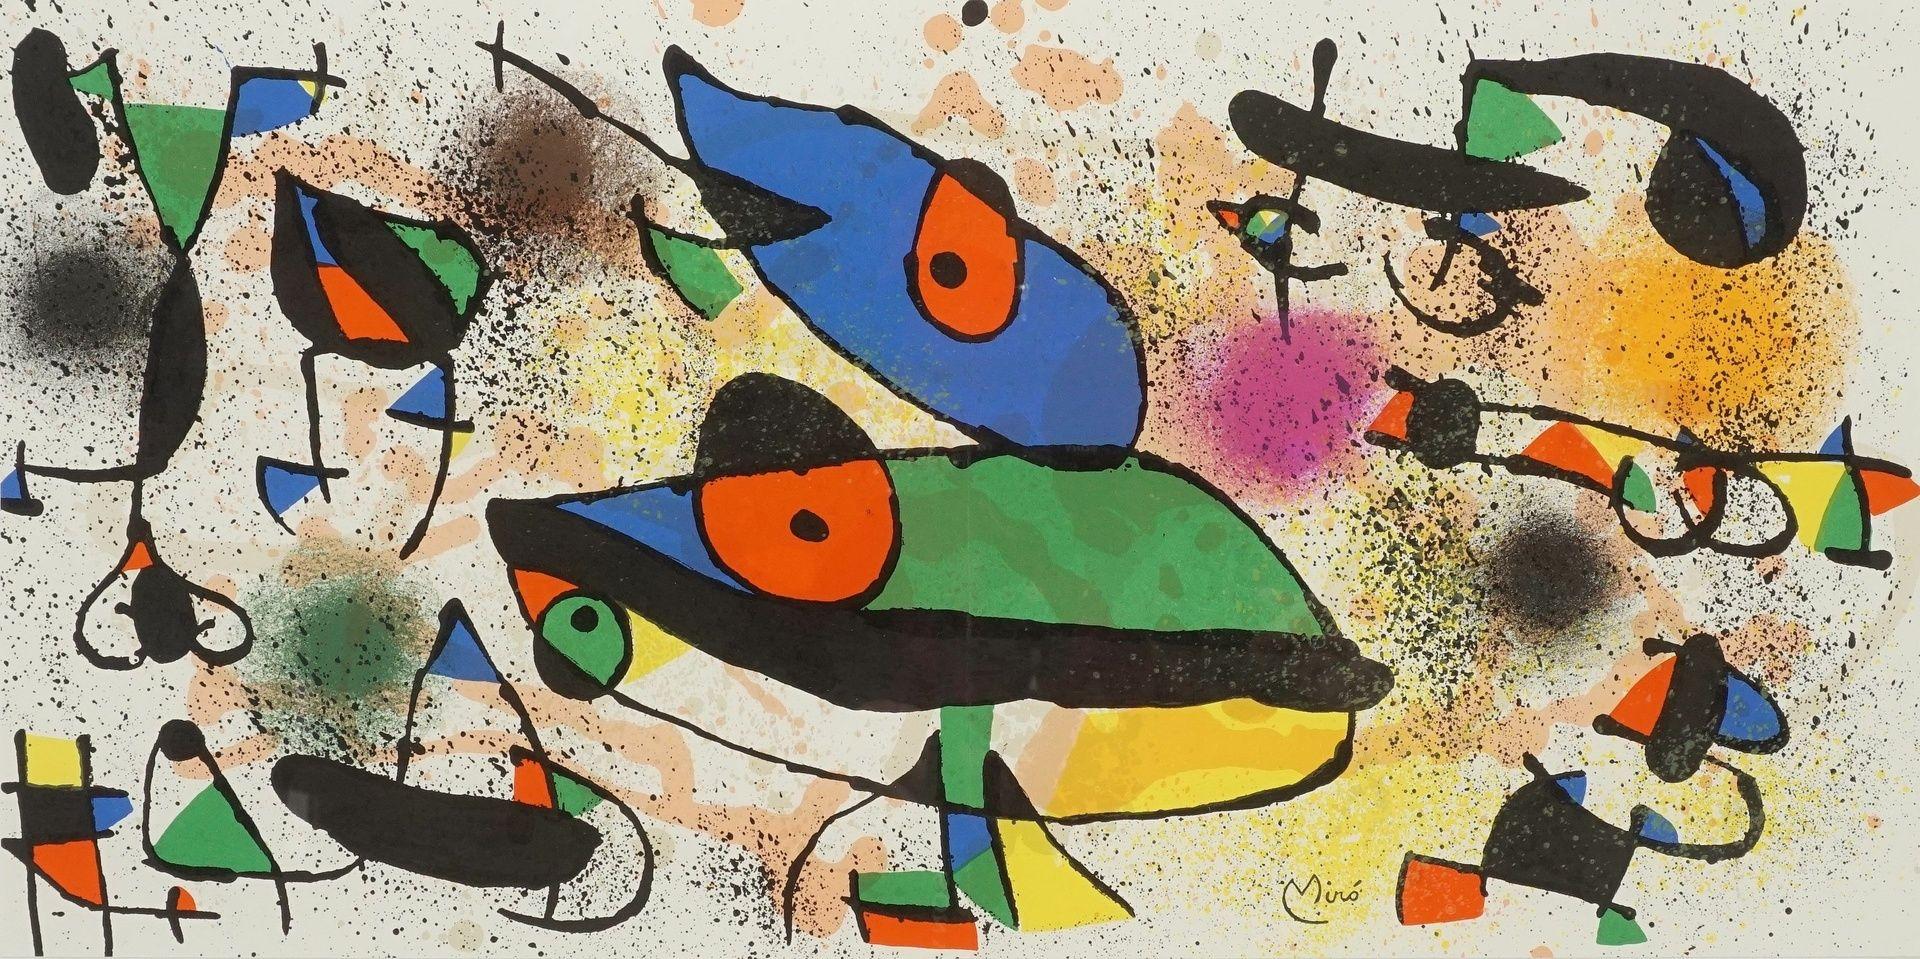 Joan Miró, Miró sculptures